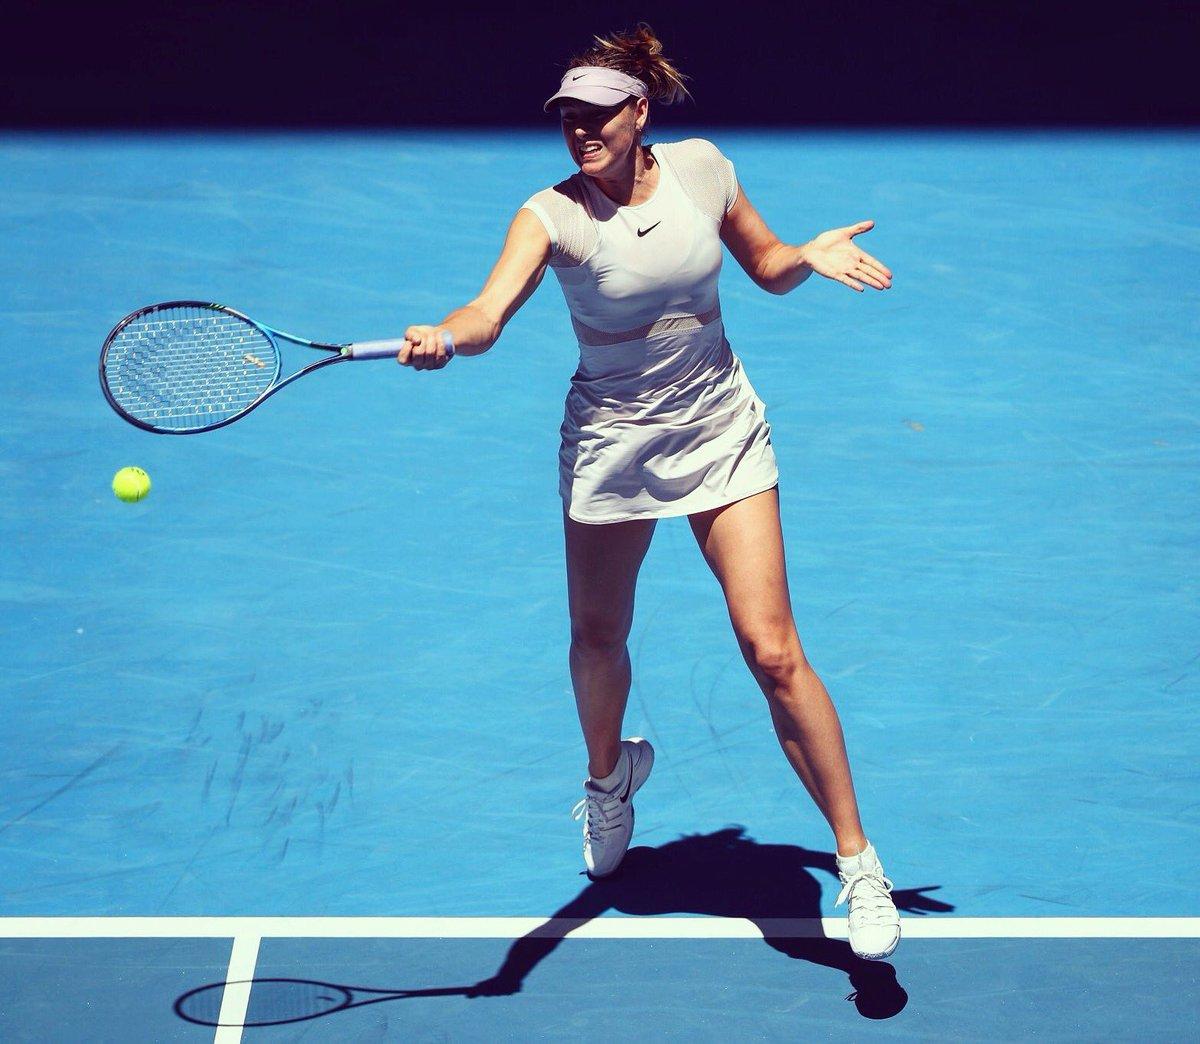 RT @MariaSharapova: Round 1 👊🏻 #AusOpen ❤️ This Dress https://t.co/d7MXpsE461